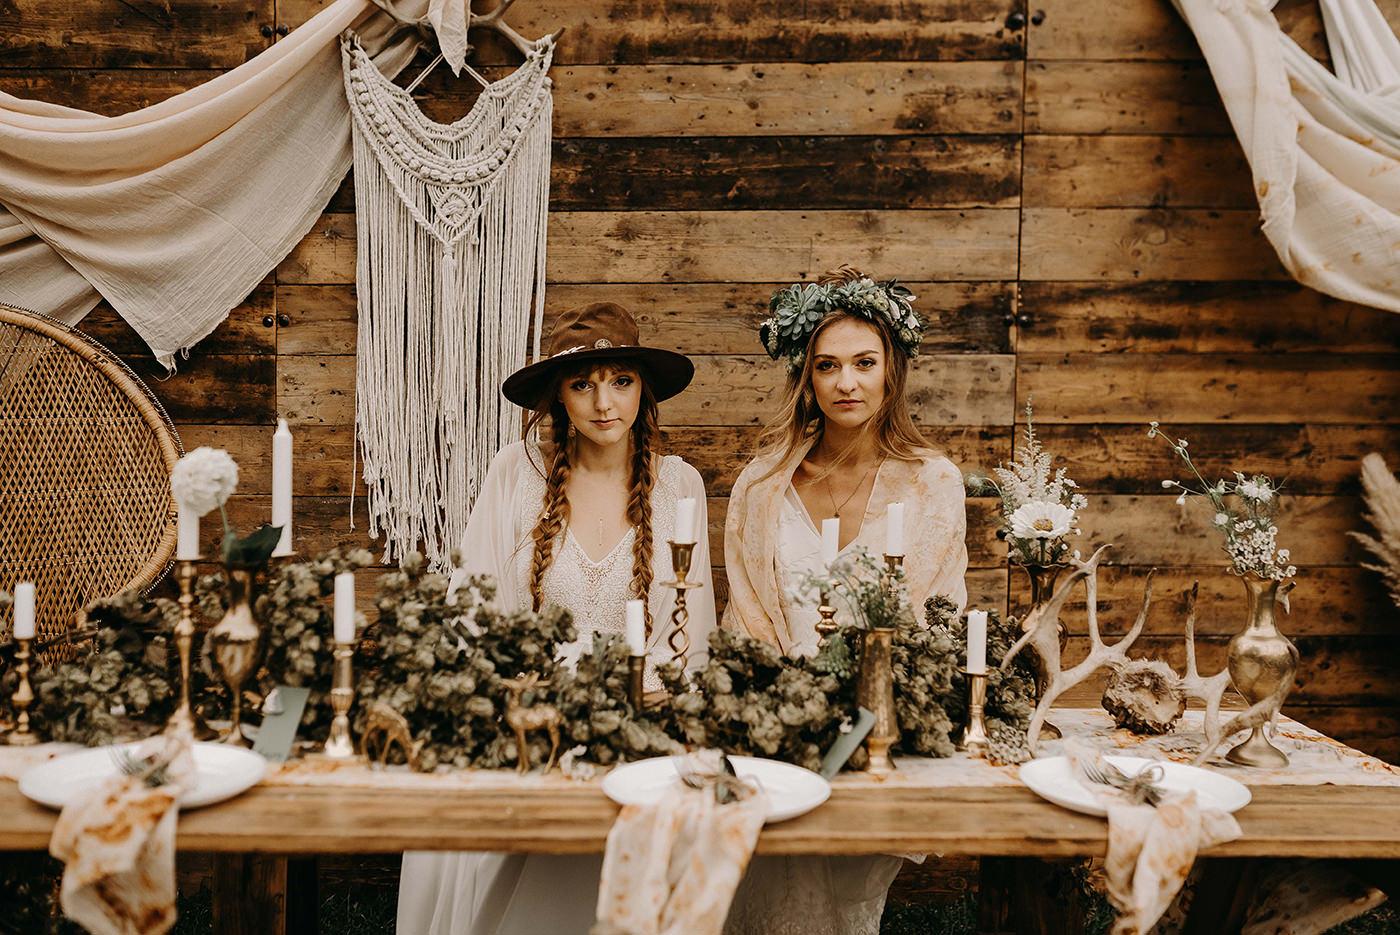 Boho Wedding Decor.Nude Bohemian Wedding Inspiration With Dried Flowers Macrame